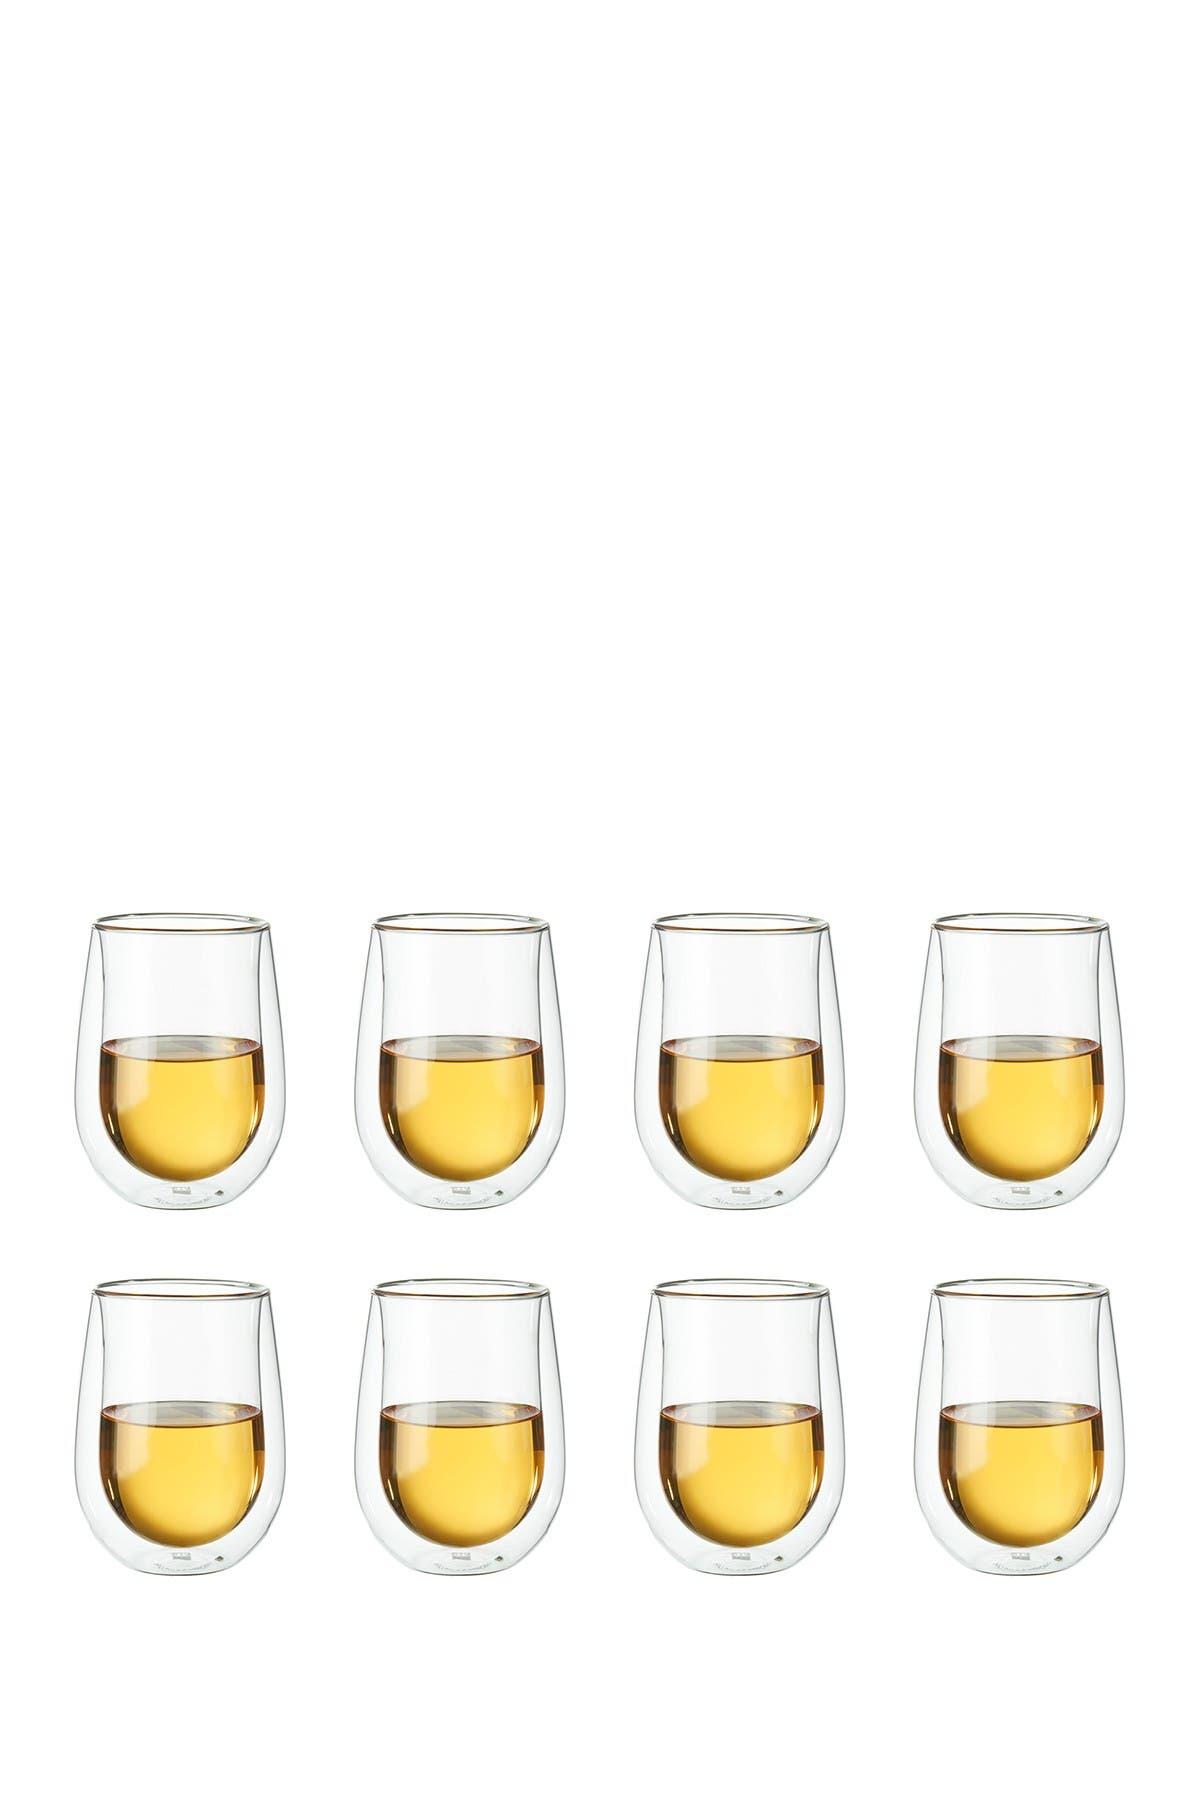 Image of JA Henckels International ZWILLING Sorrento Double-Wall White Wine Stemless Glass 8-Piece Set